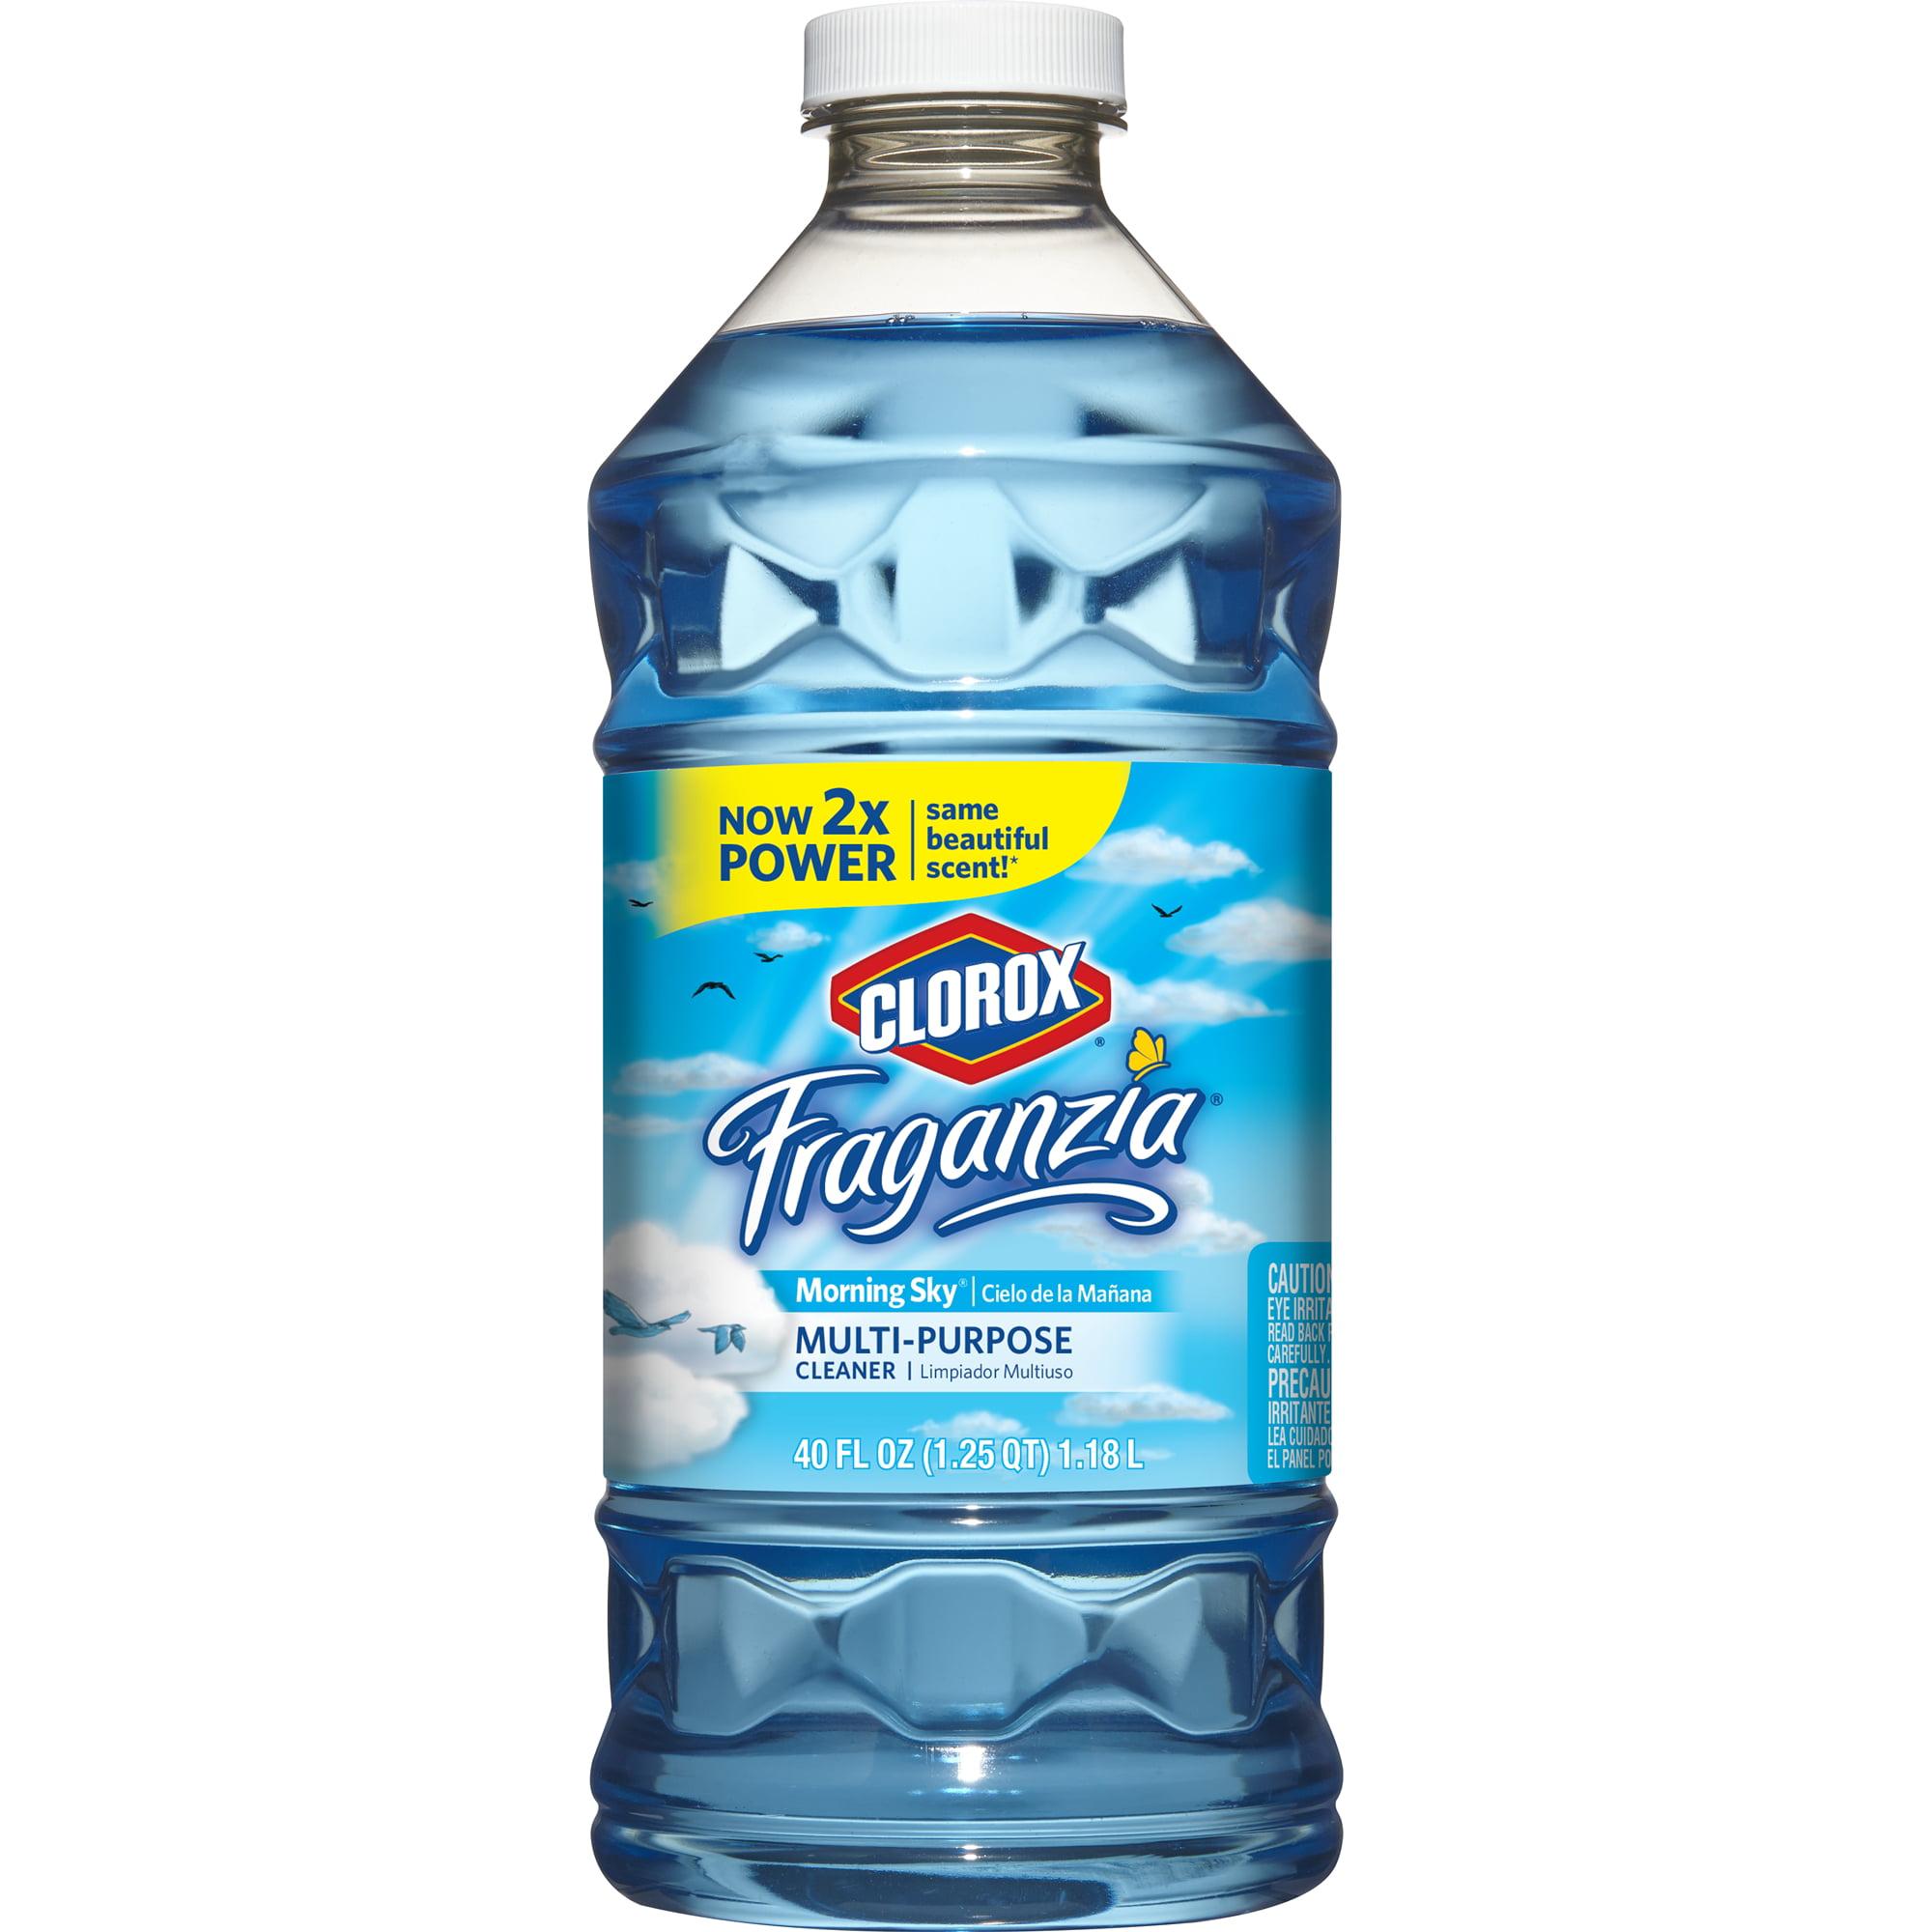 Clorox Fraganzia Multi-Purpose Cleaner, Morning Sky, 40 oz - Walmart.com